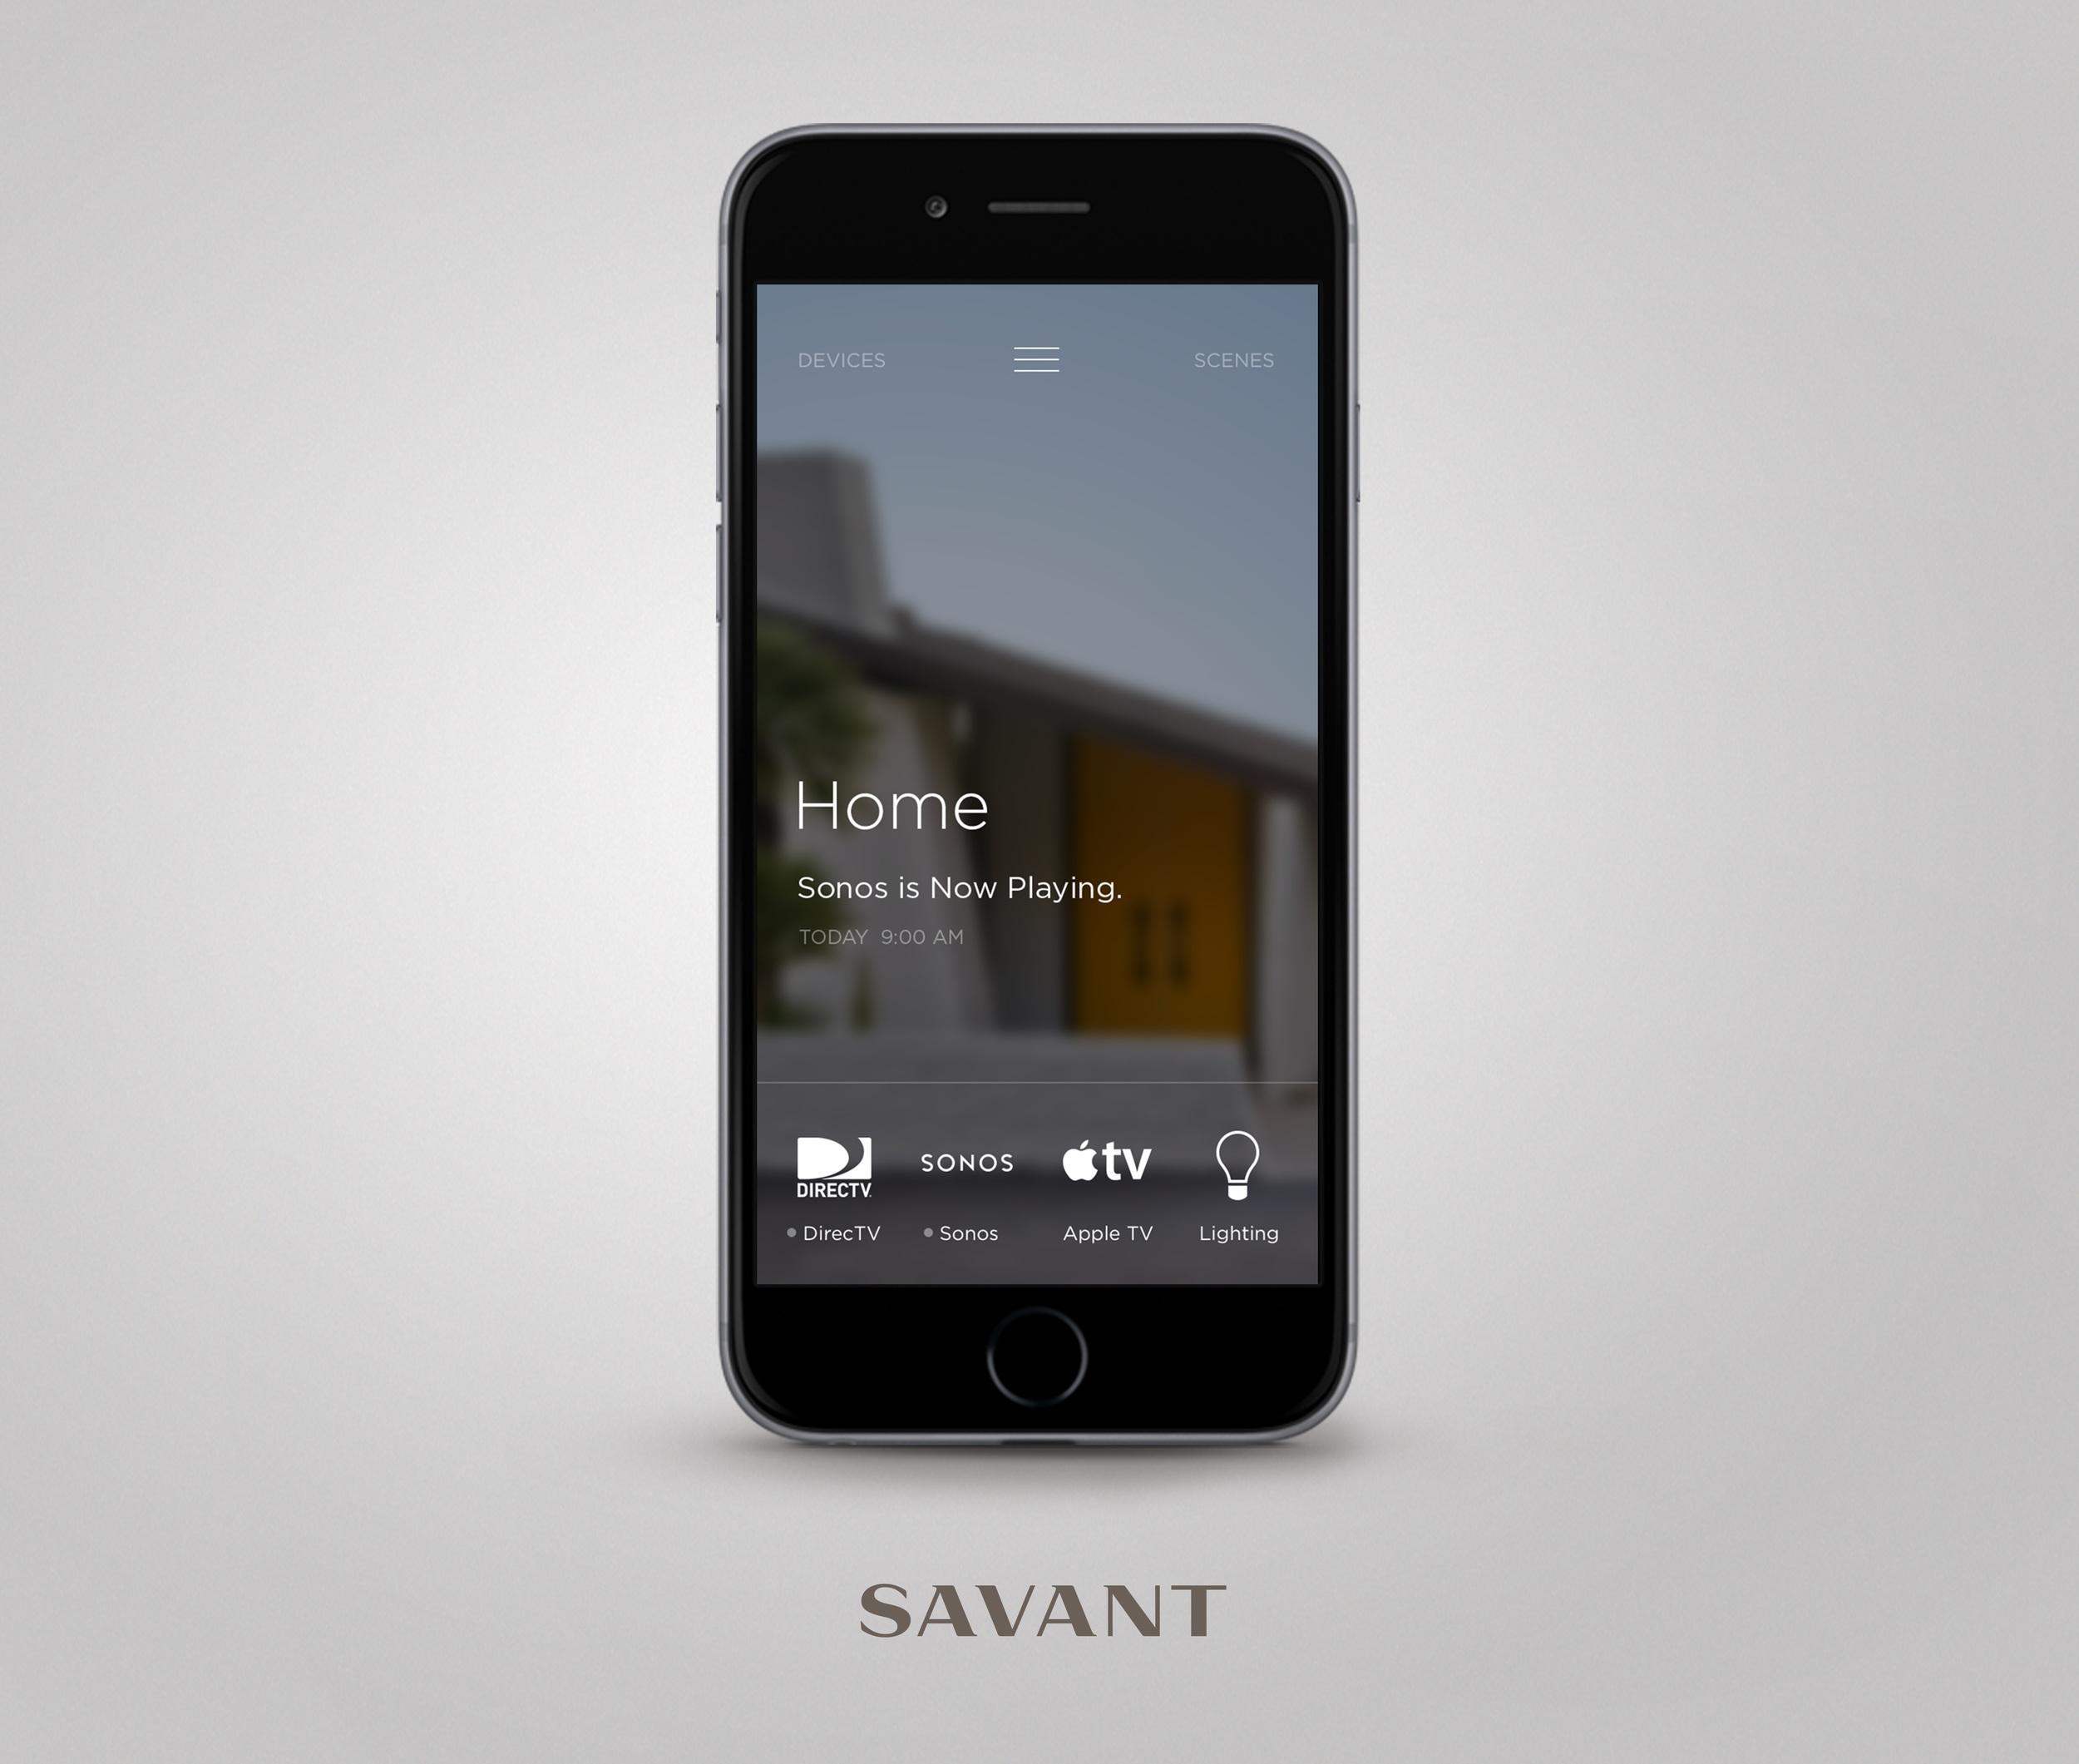 Savant App - Photograph courtesy of Savant